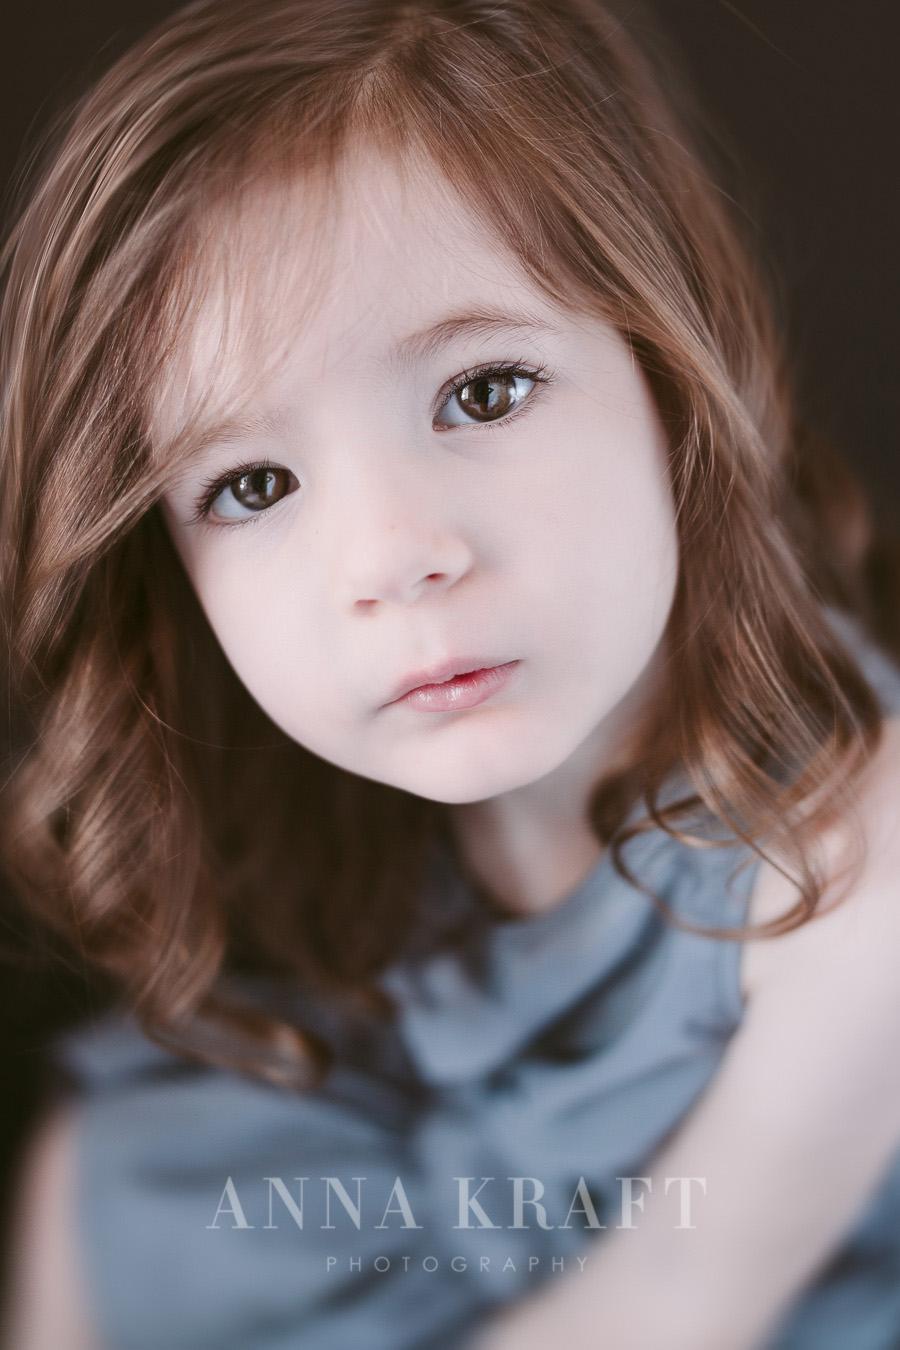 anna_kraft_photography_mother_daughter_georgetown_custom_boutique_portrait-2.JPG